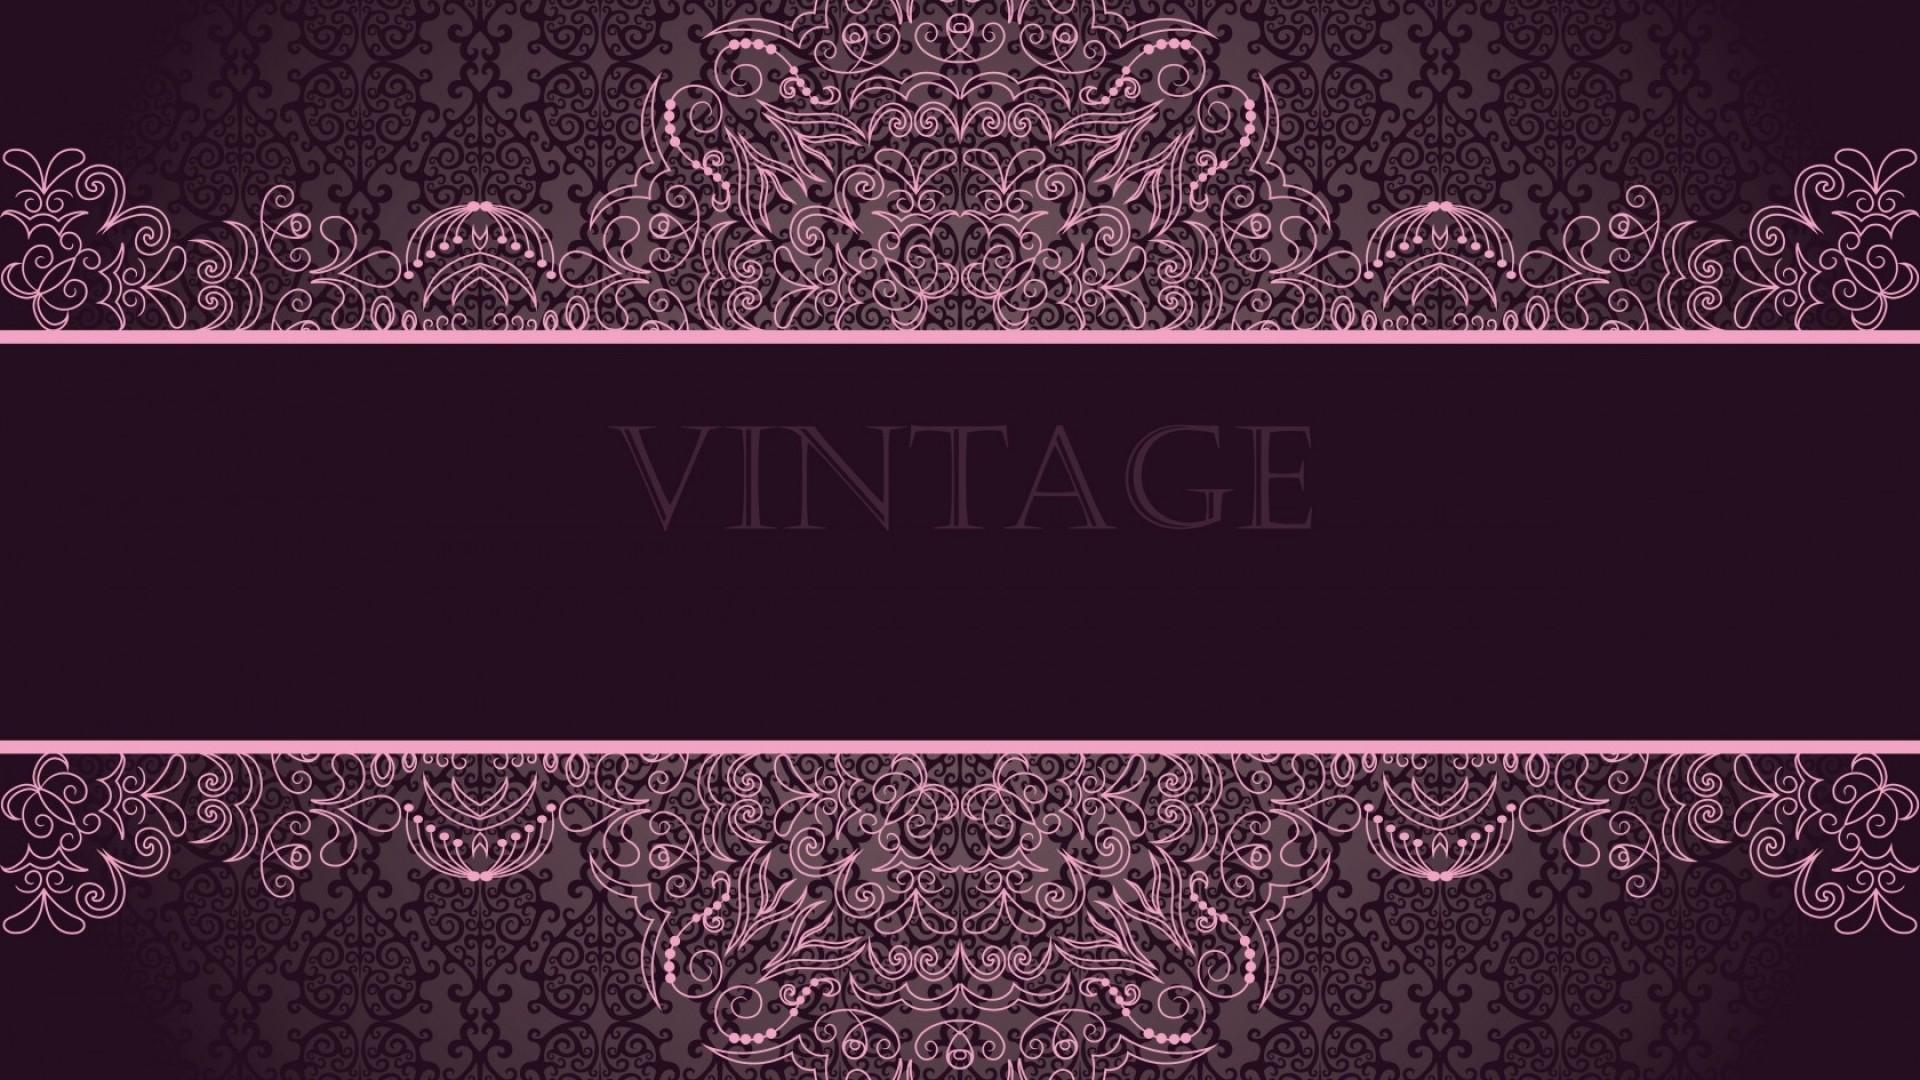 40+ Vintage backgrounds ·① Download free stunning ...